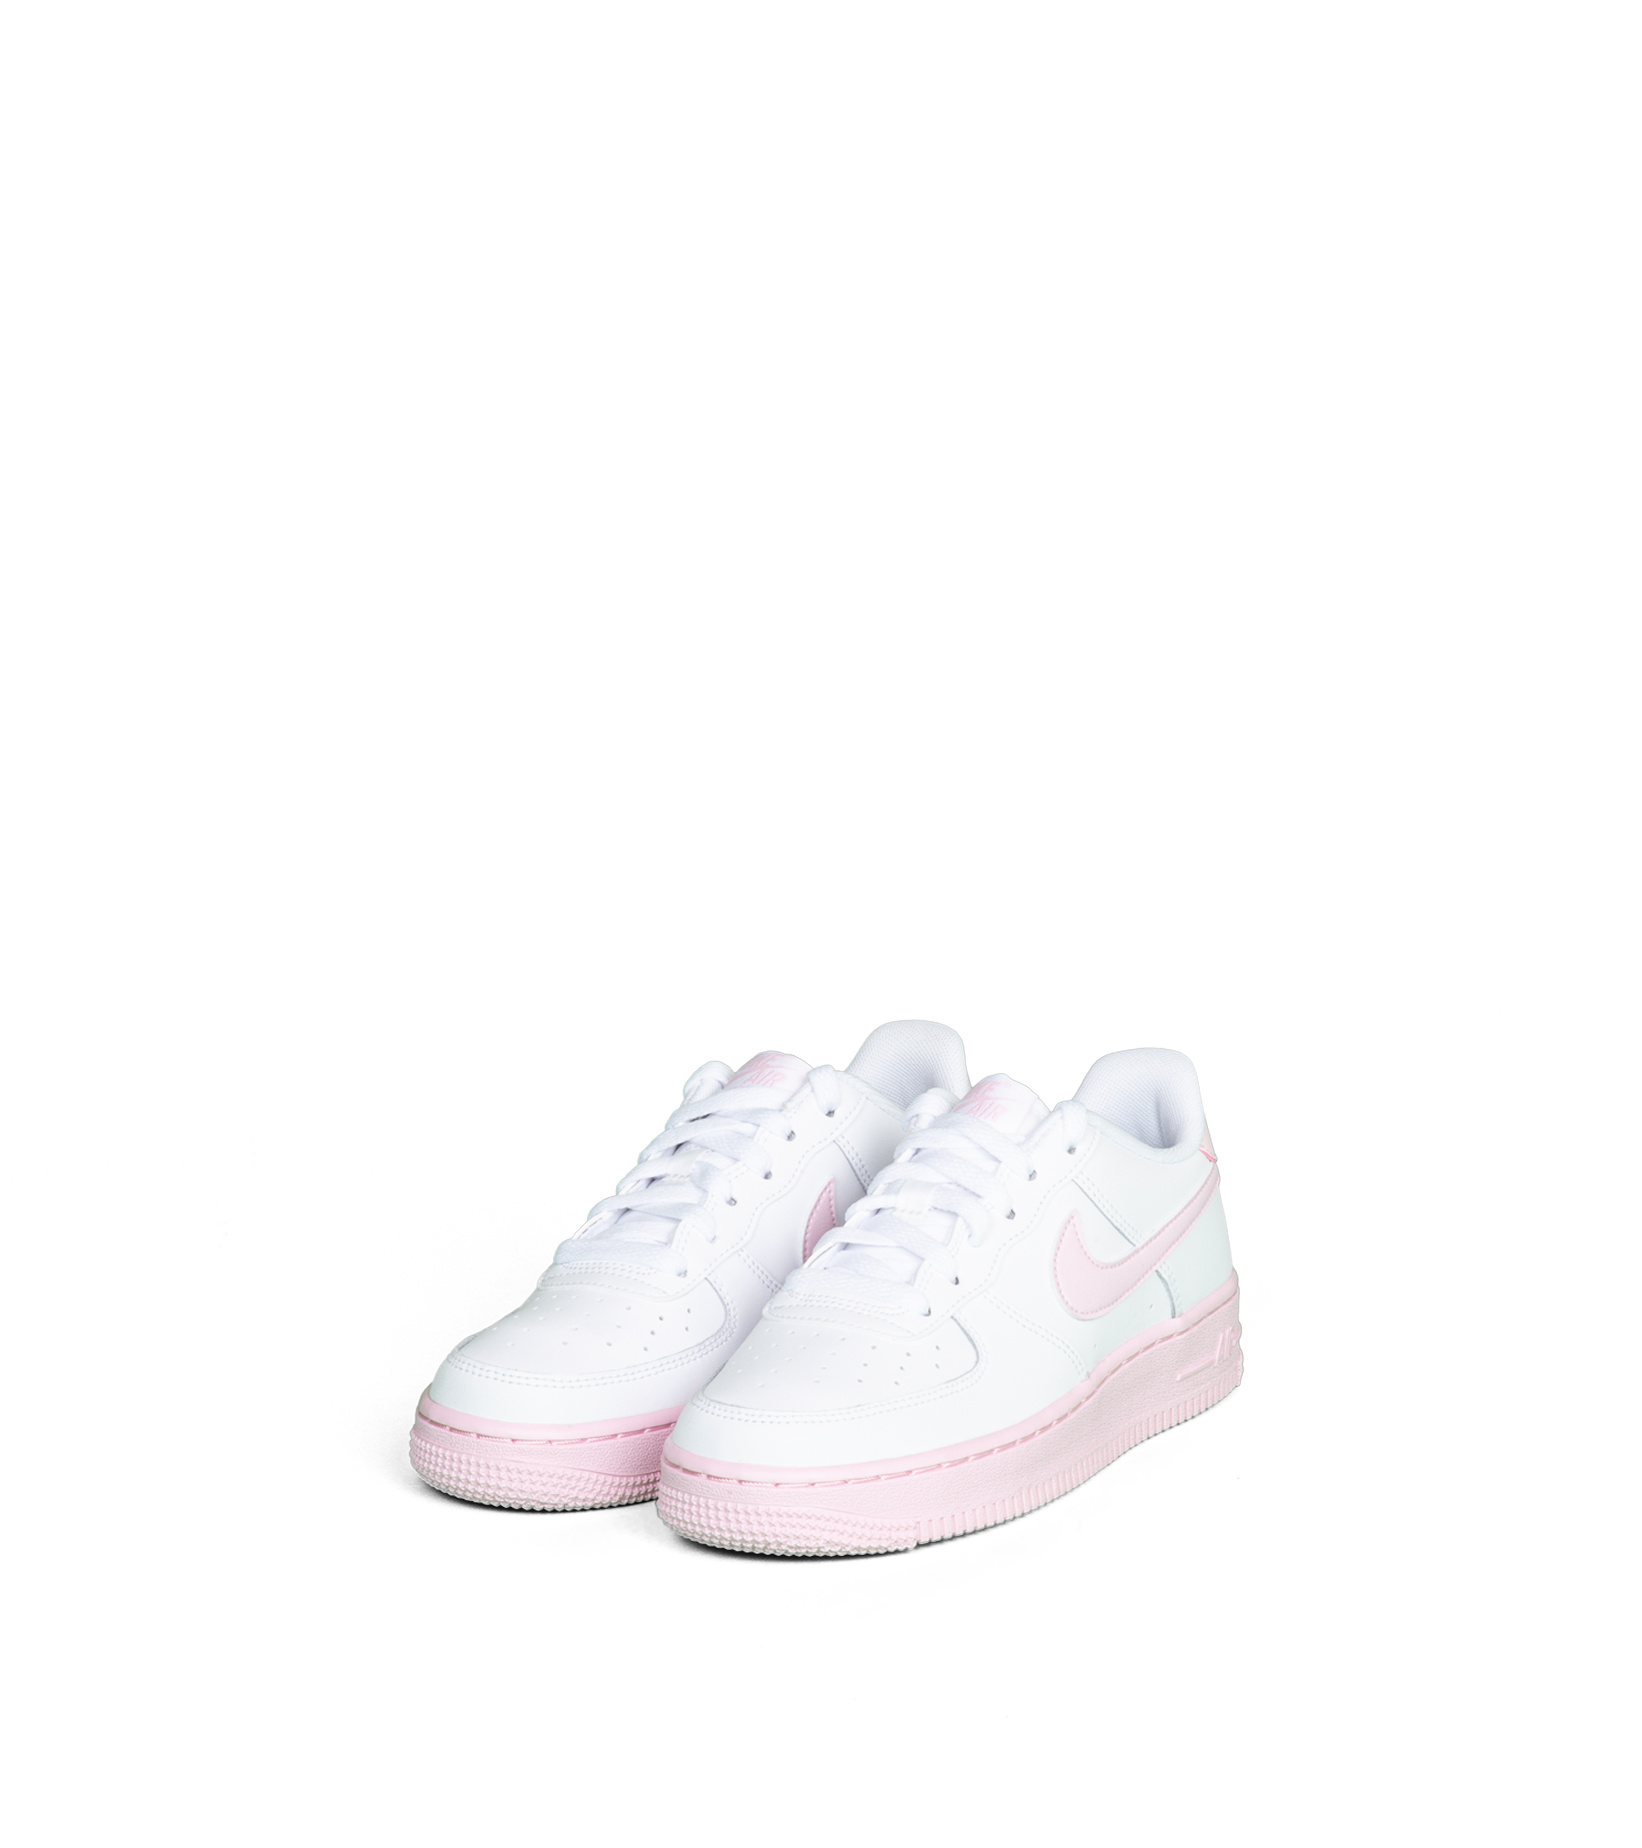 "Air Force 1 (GS) ""White/Pink Foam""-1"